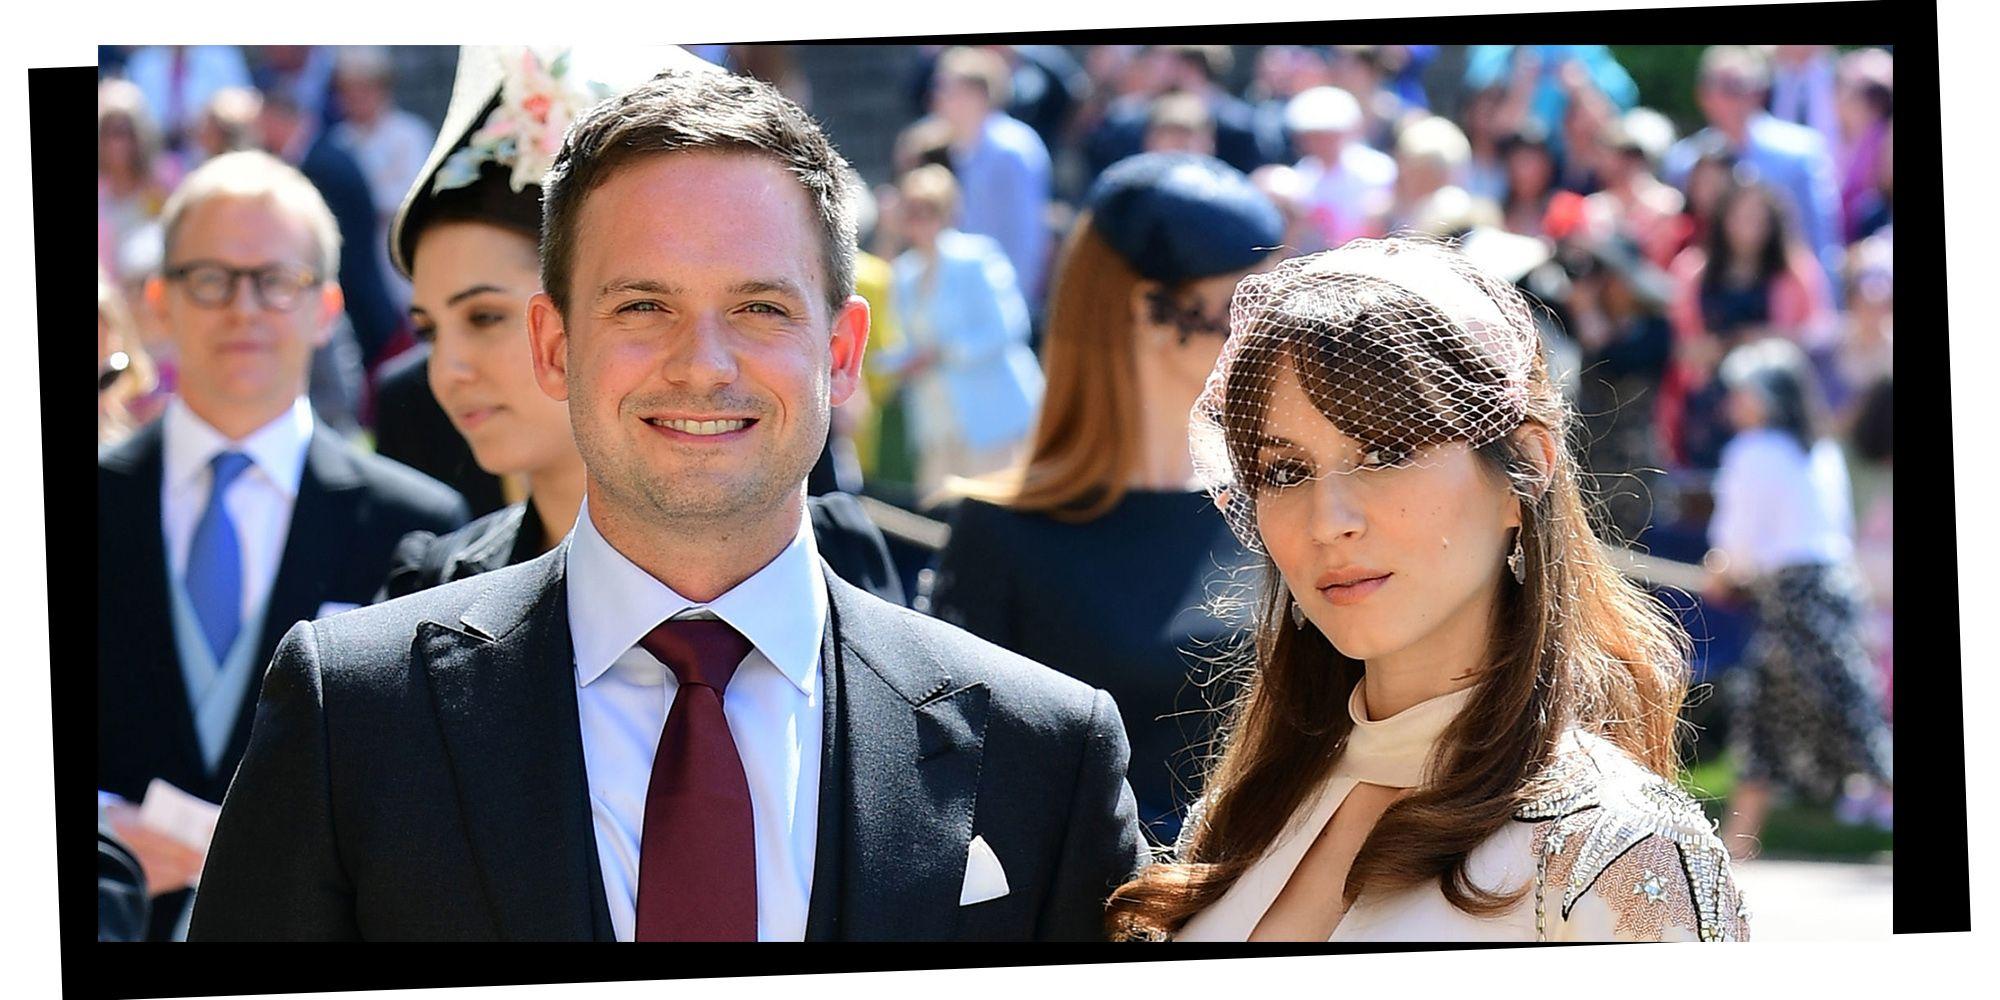 Suits' Patrick Adams and wife Troian Bellisario secretly had a baby